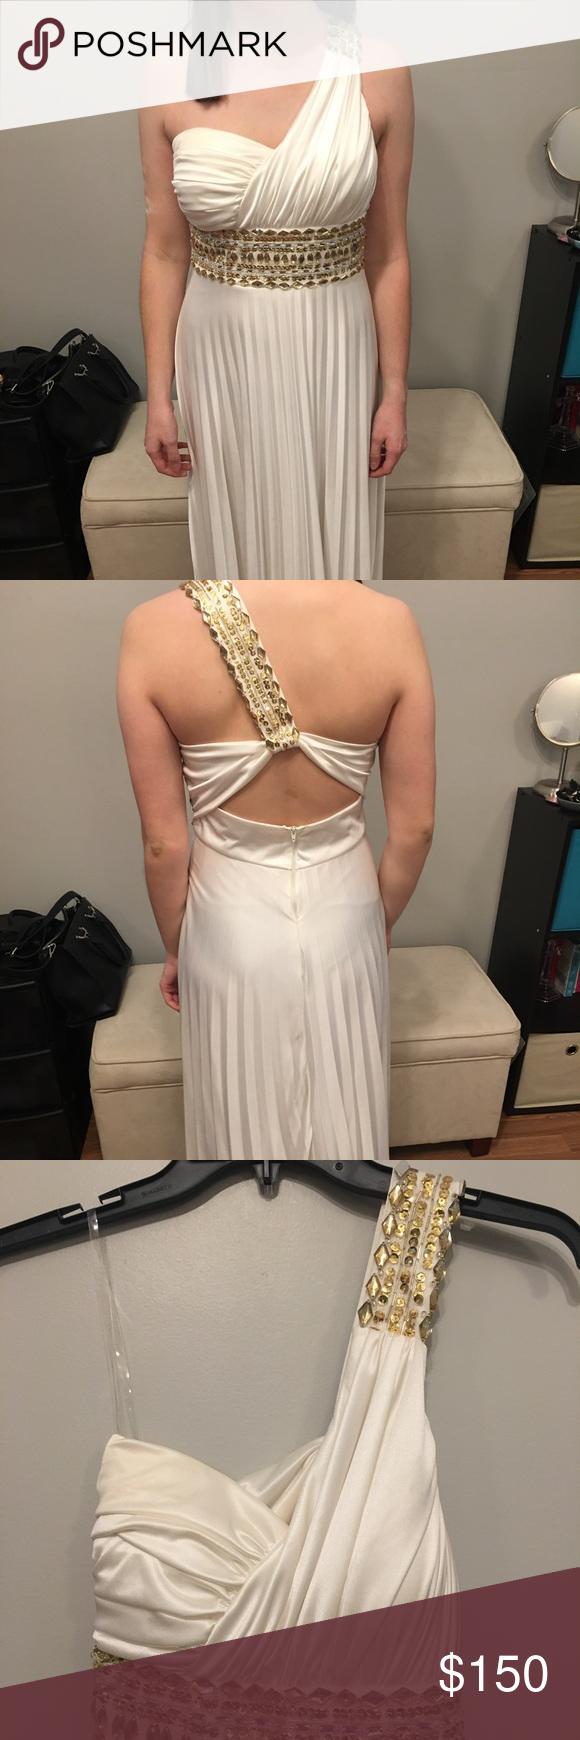 Creamgold jewel long dress worn once prom ball my posh picks